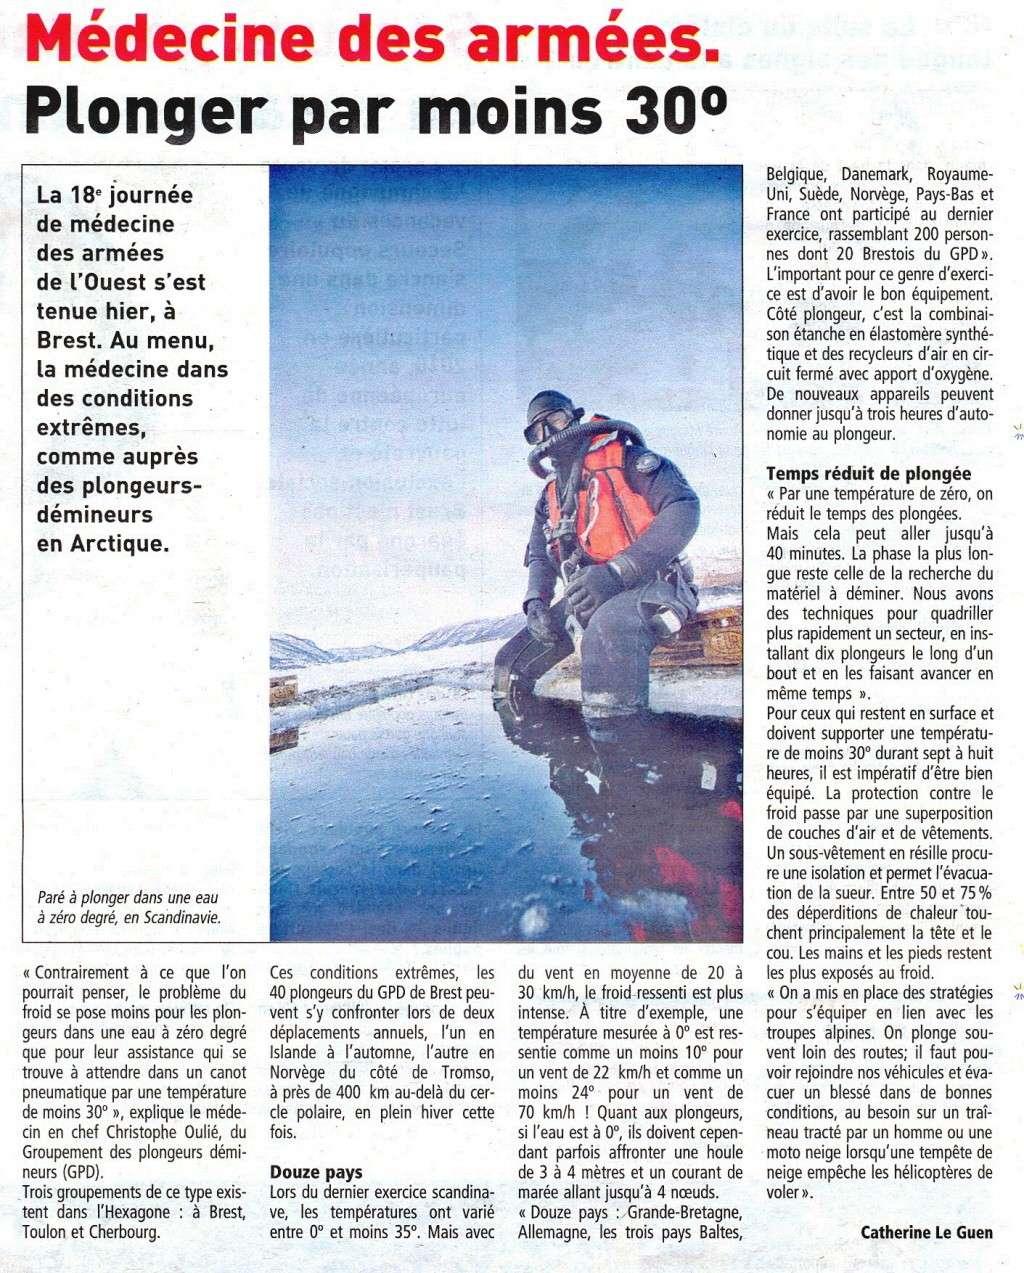 [Plongeurs démineurs] PLONGEURS DÉMINEURS - Page 3 Plonge10